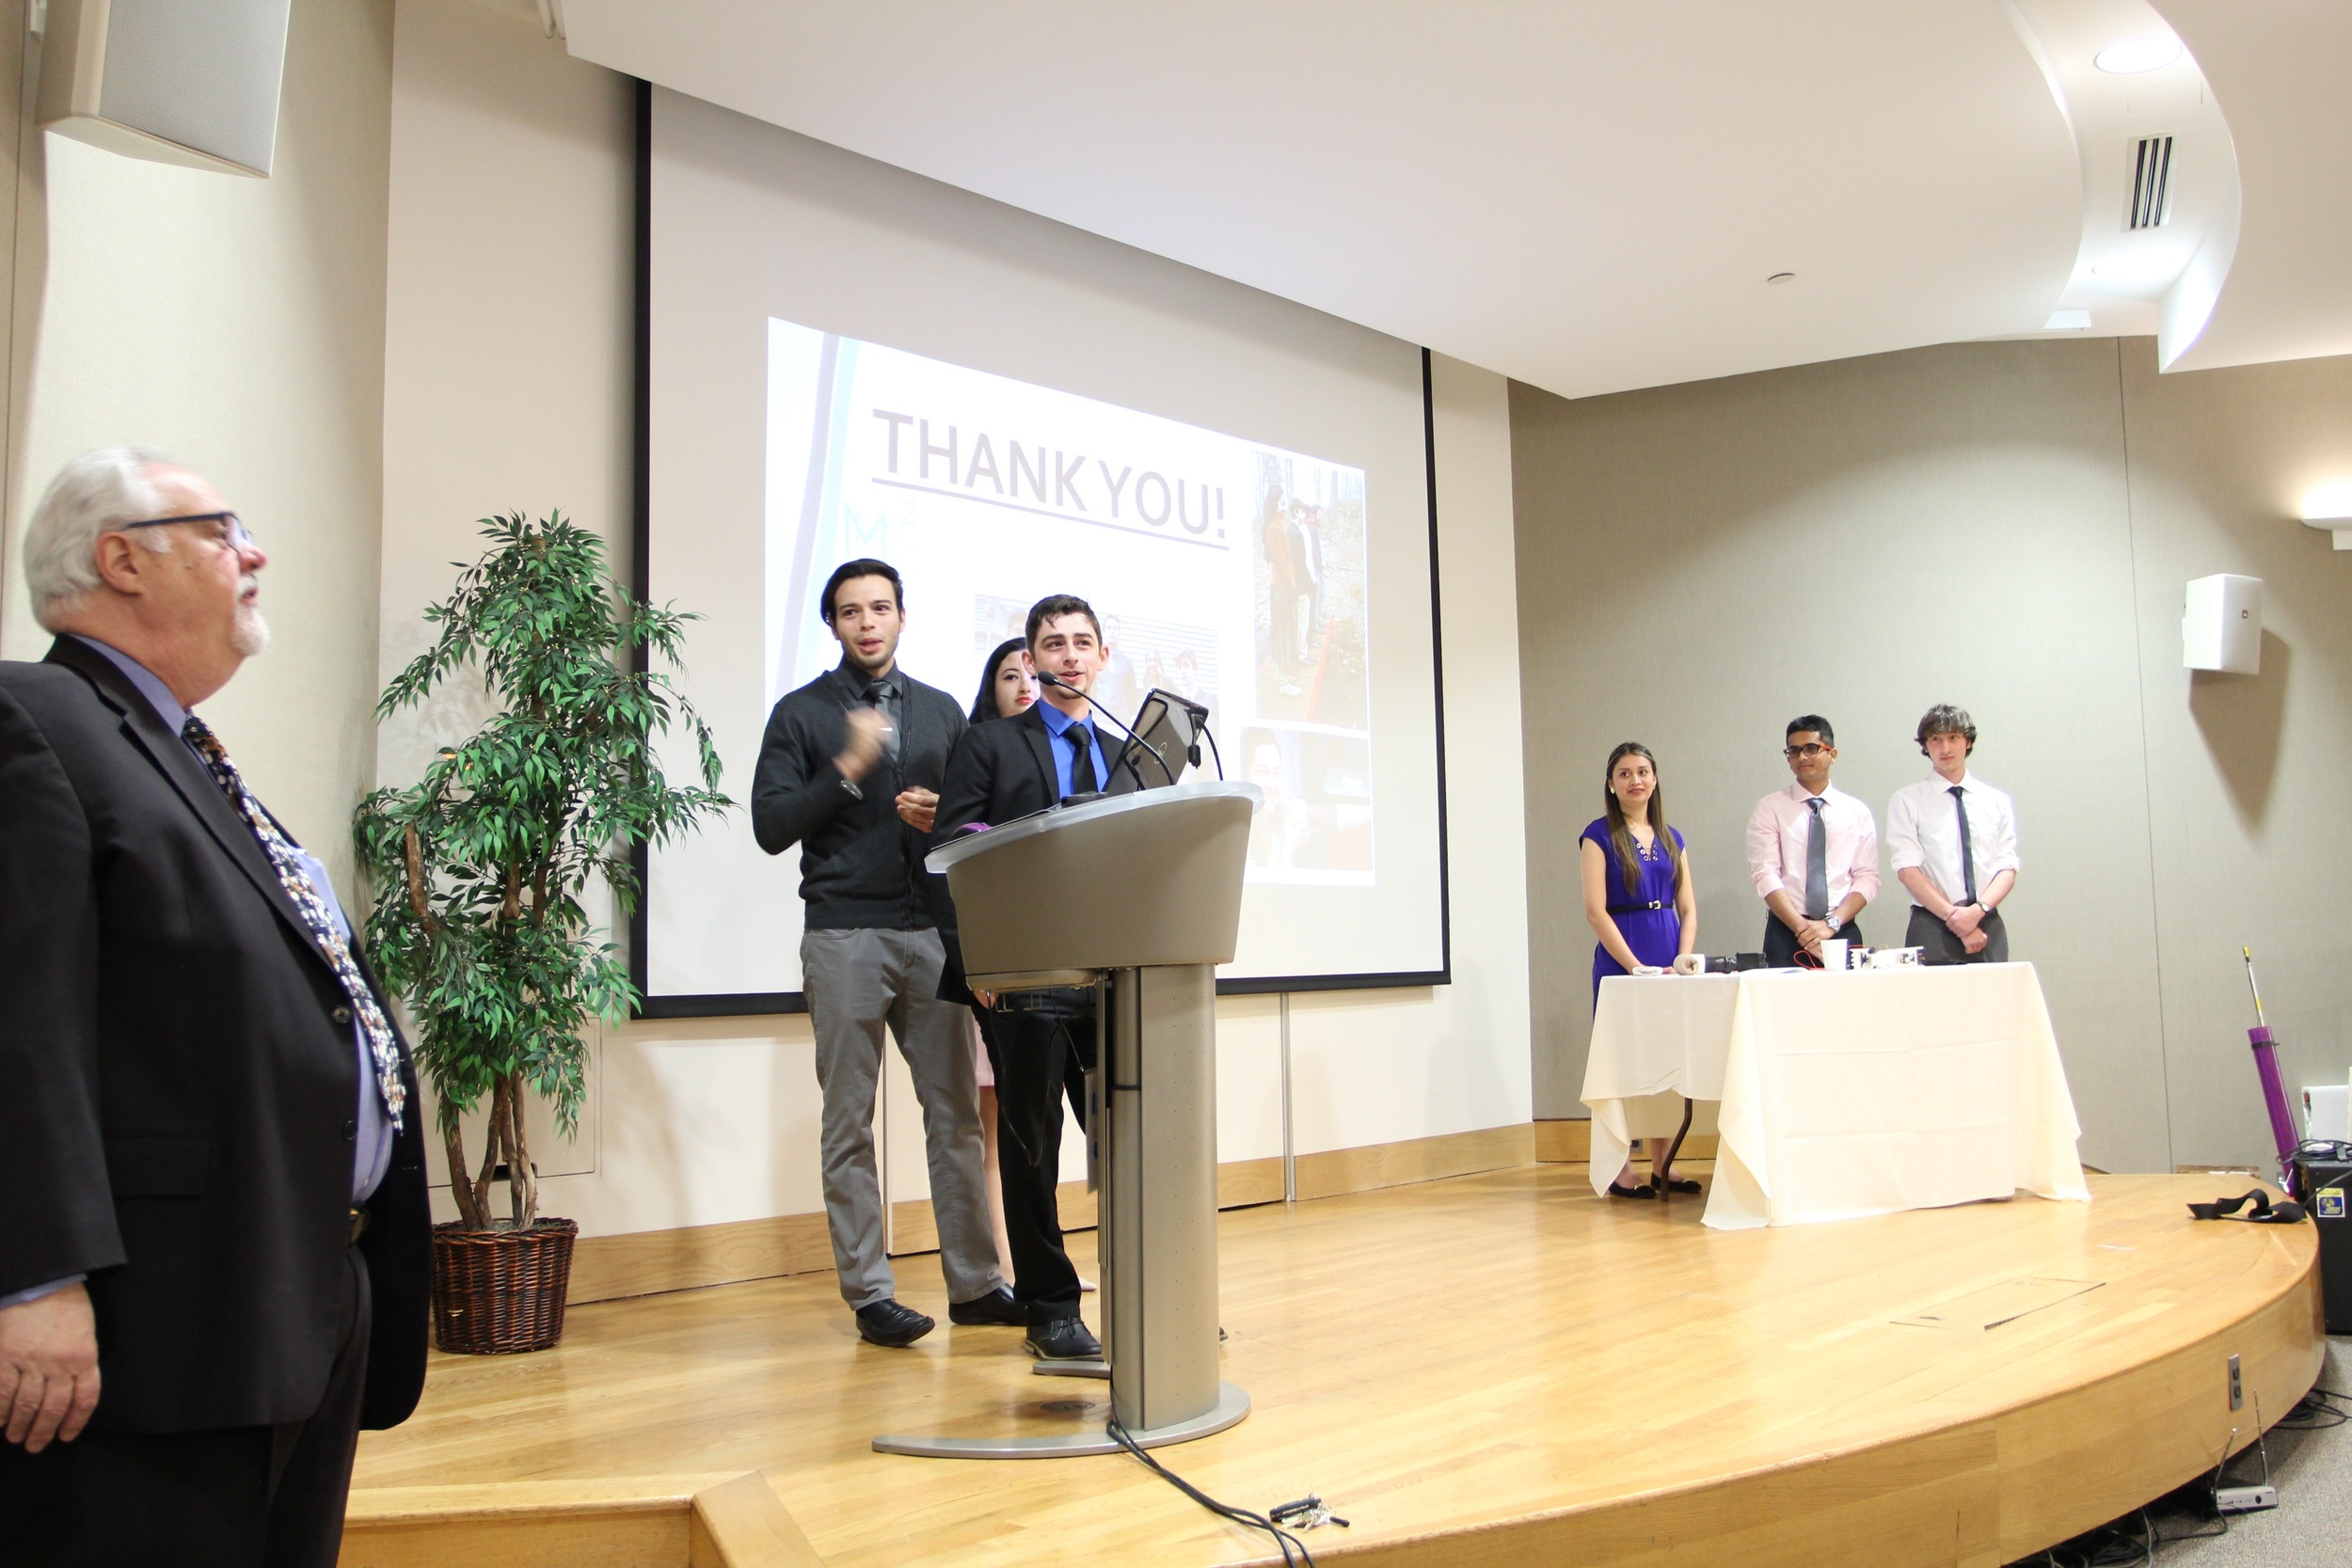 Prosthetic Arm Team: Gabriel Valero (Team Lead, UHA), Nafely Frutos (QVCC), Dhrumil Shah (TXCC), Geneva Marsh (NCC), Landon Renzullo (CCSU), Alexander Cartwright (UHA), Lindsay Jimenez (UCONN)